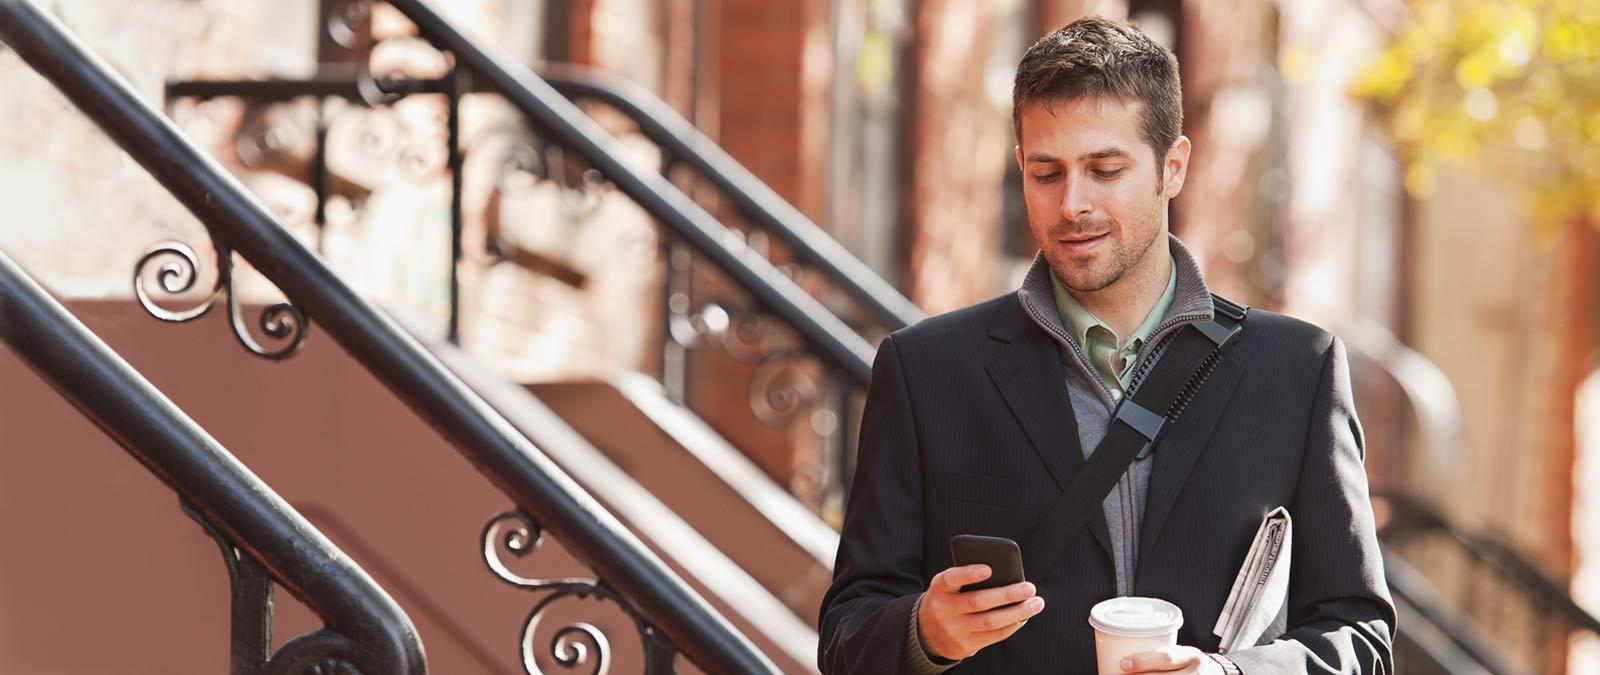 Muškarac drži pametni telefon i koristi Office 365 Enterprise E1.